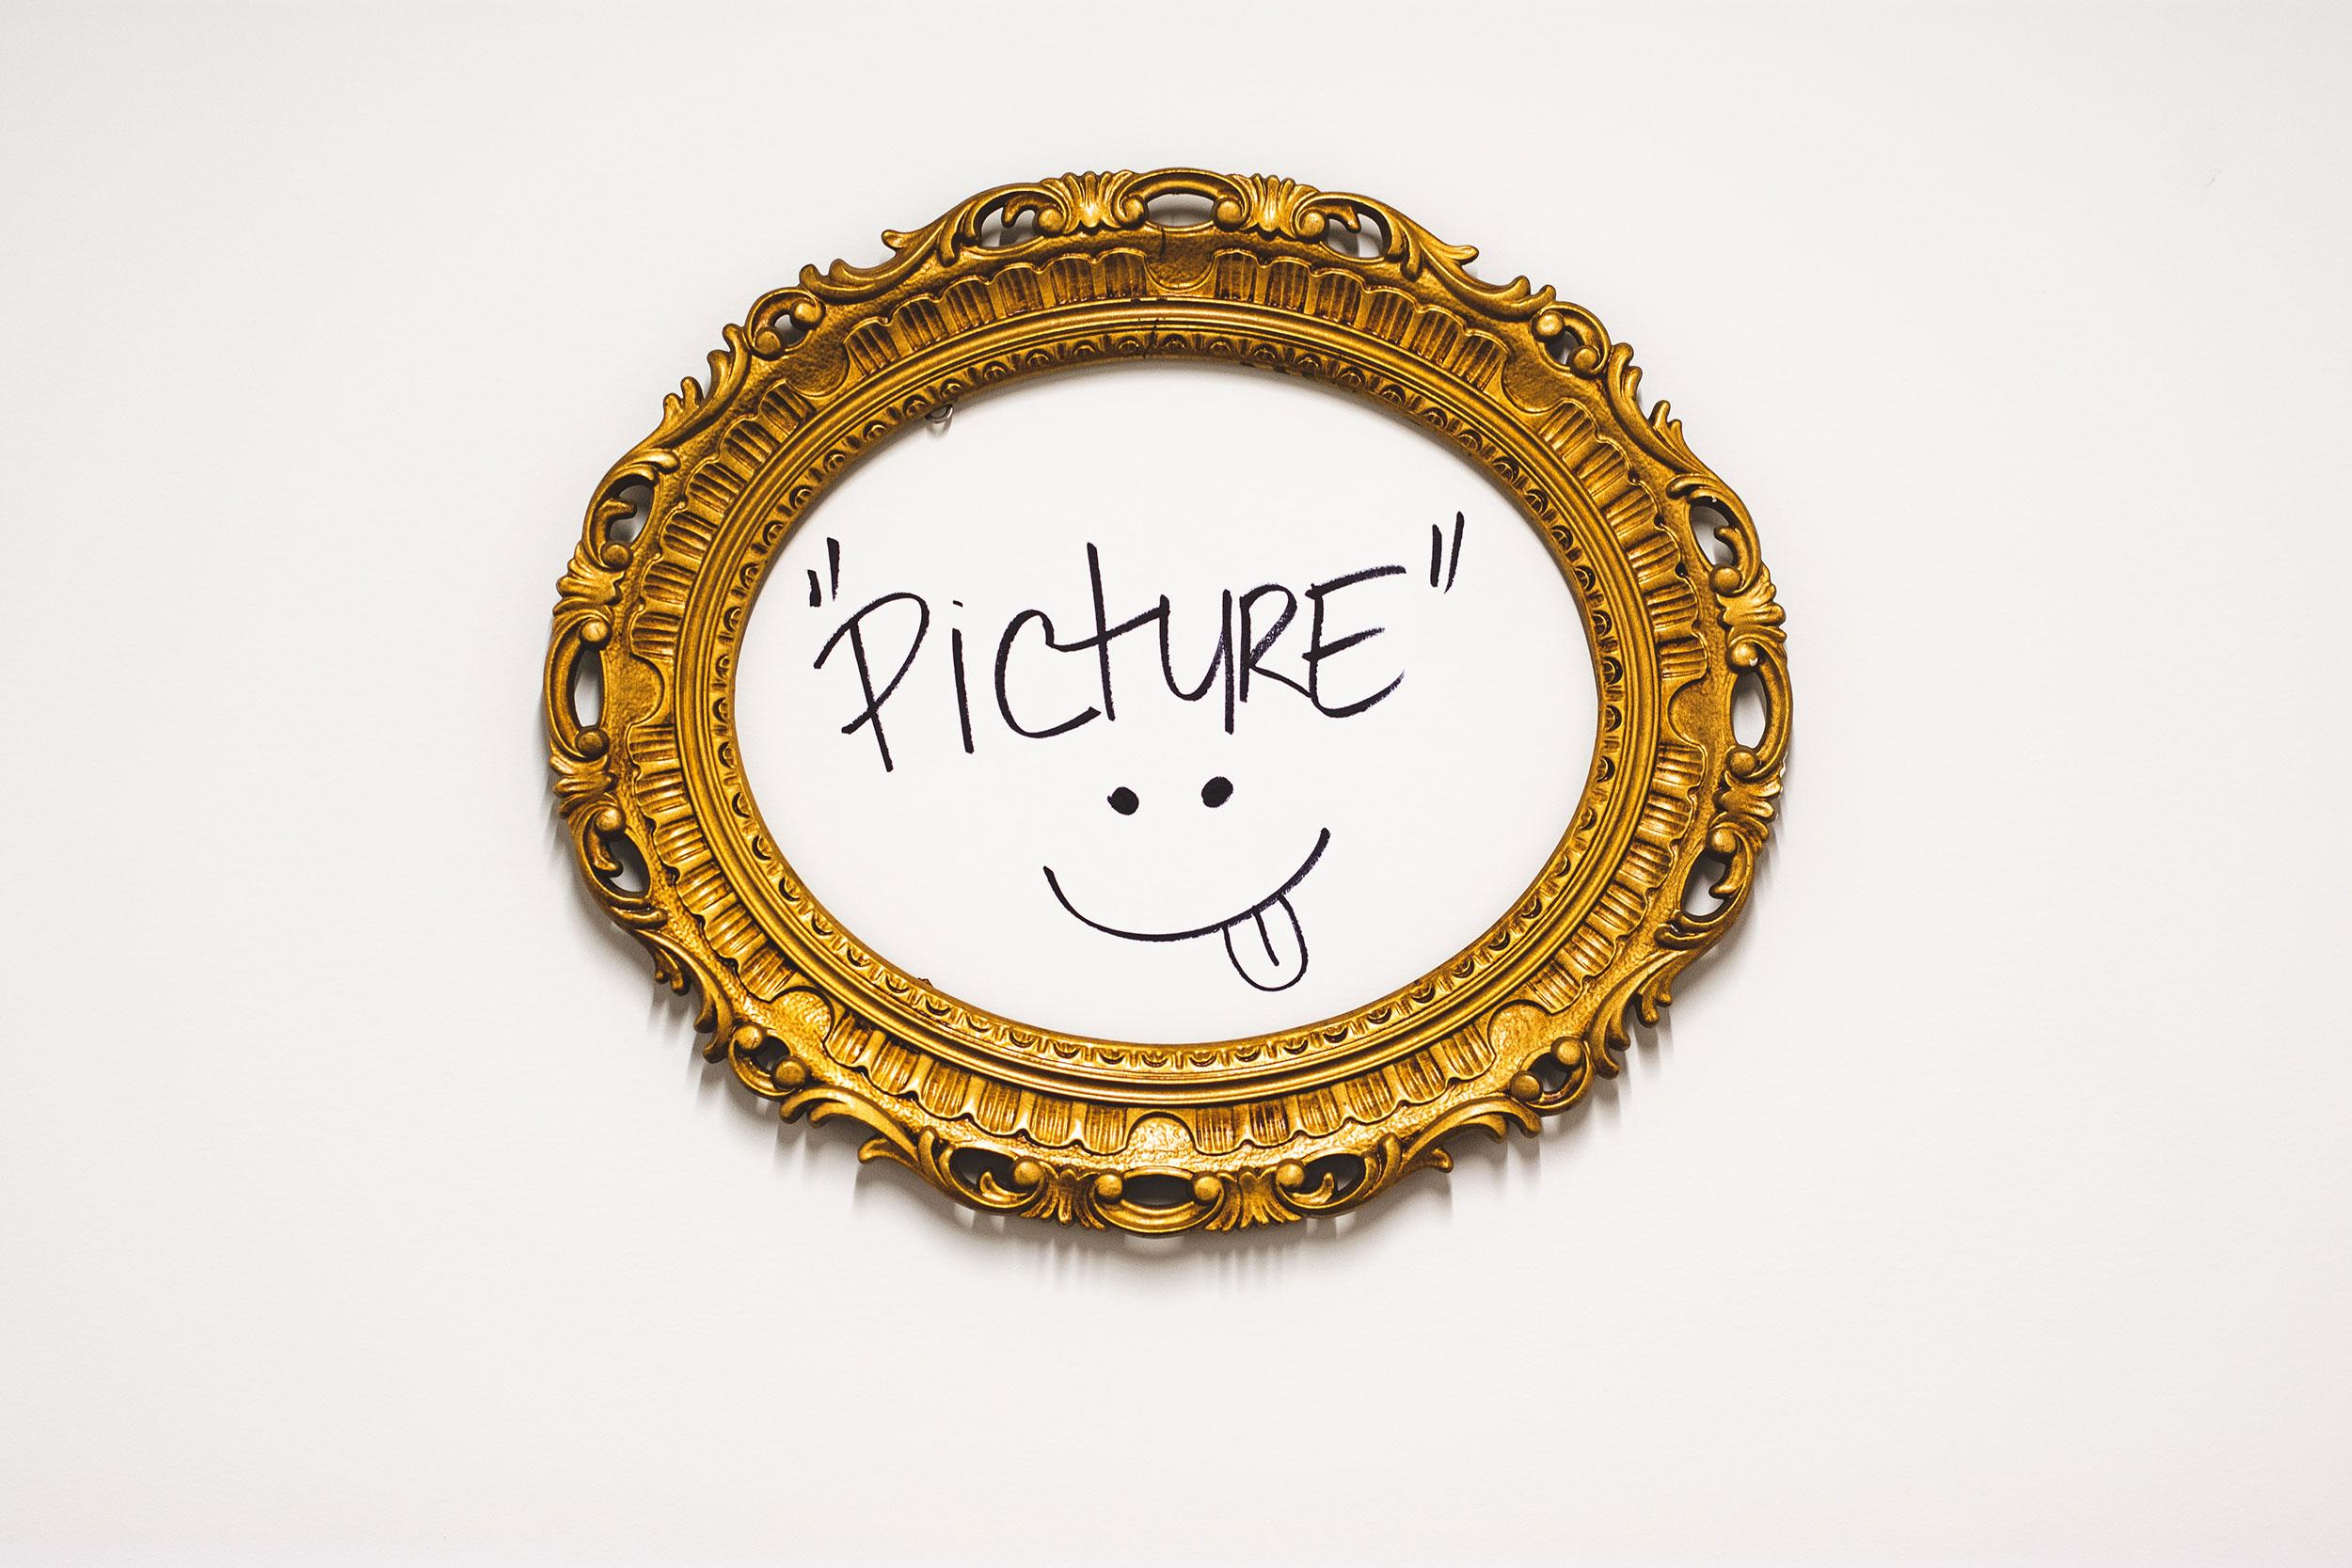 picture-illustration-in-frame